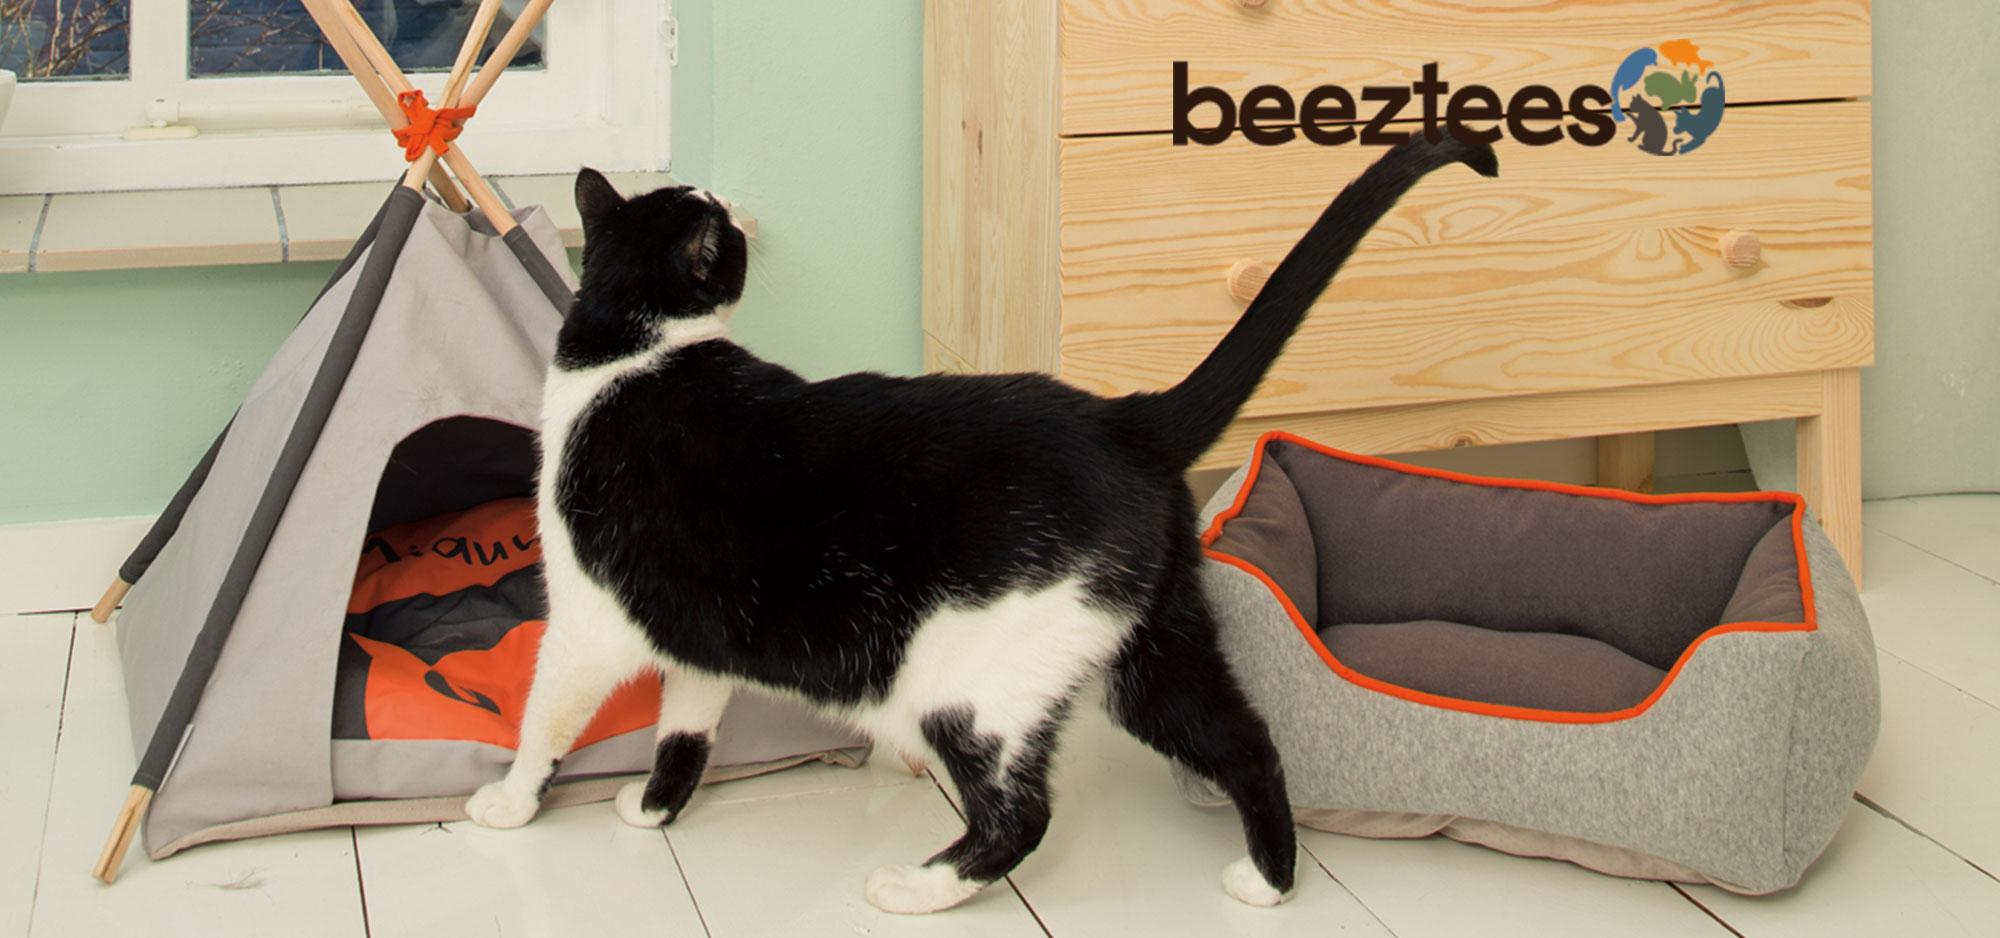 Beeztees Katzenzubehör Fresh, Bild 2